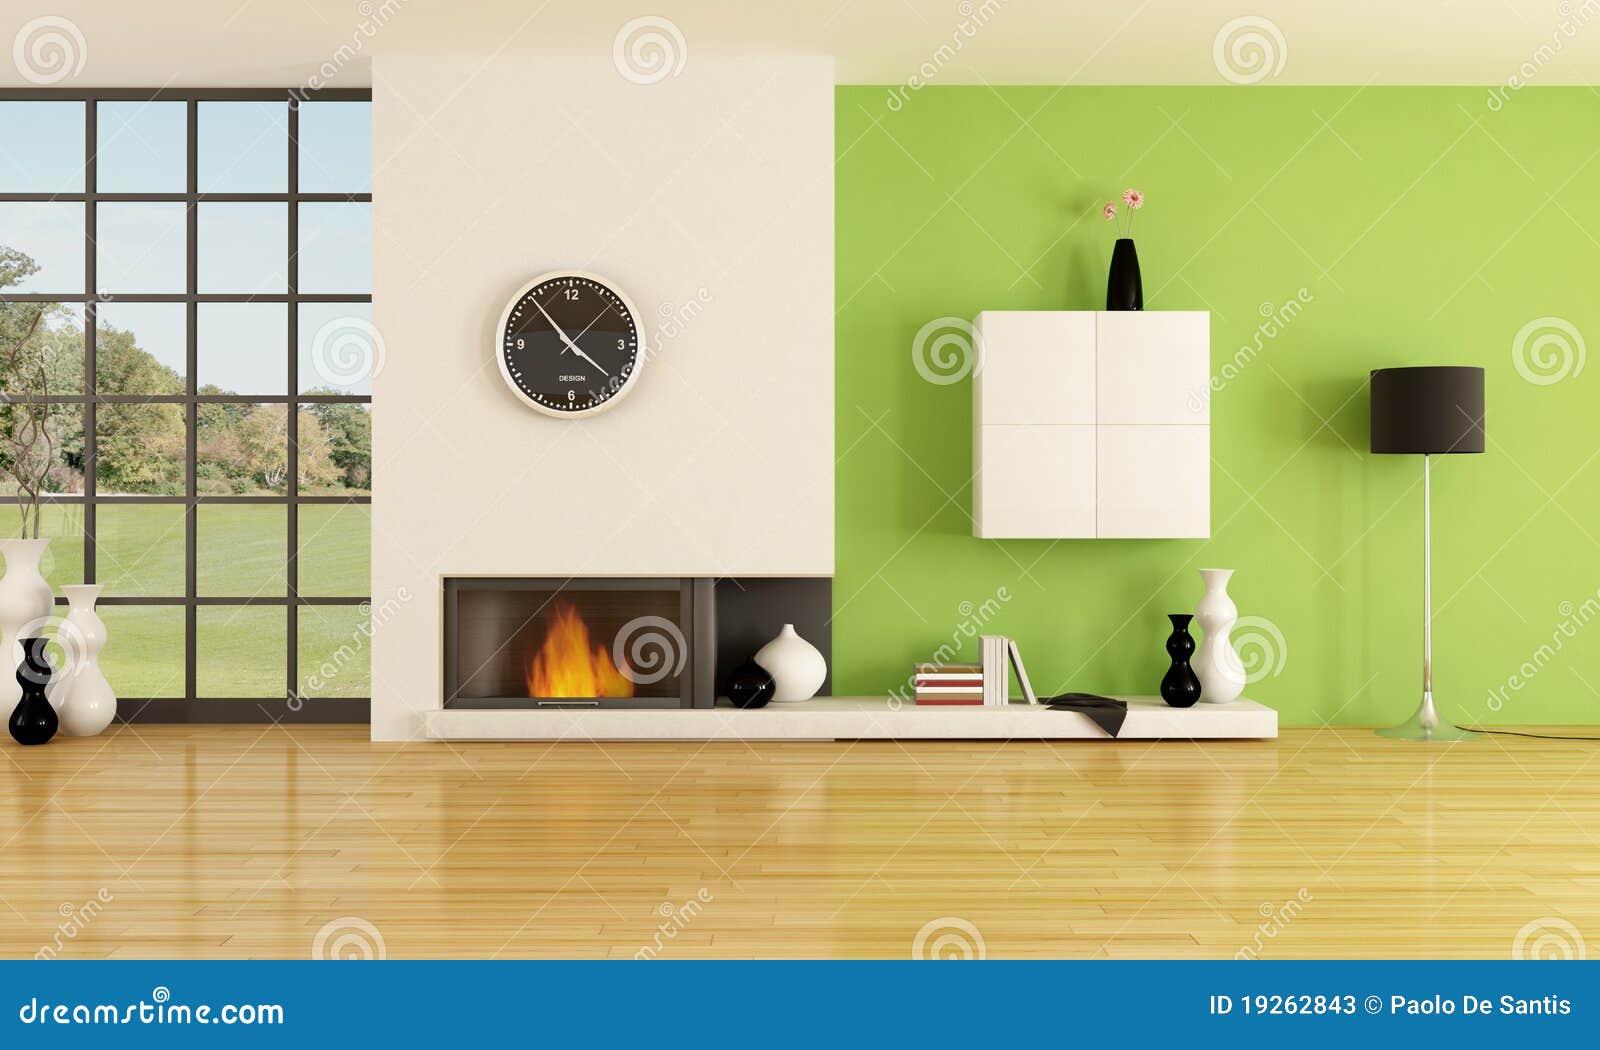 Chimenea minimalista stock de ilustraci n ilustraci n de interior 19262843 - Chimeneas minimalistas ...